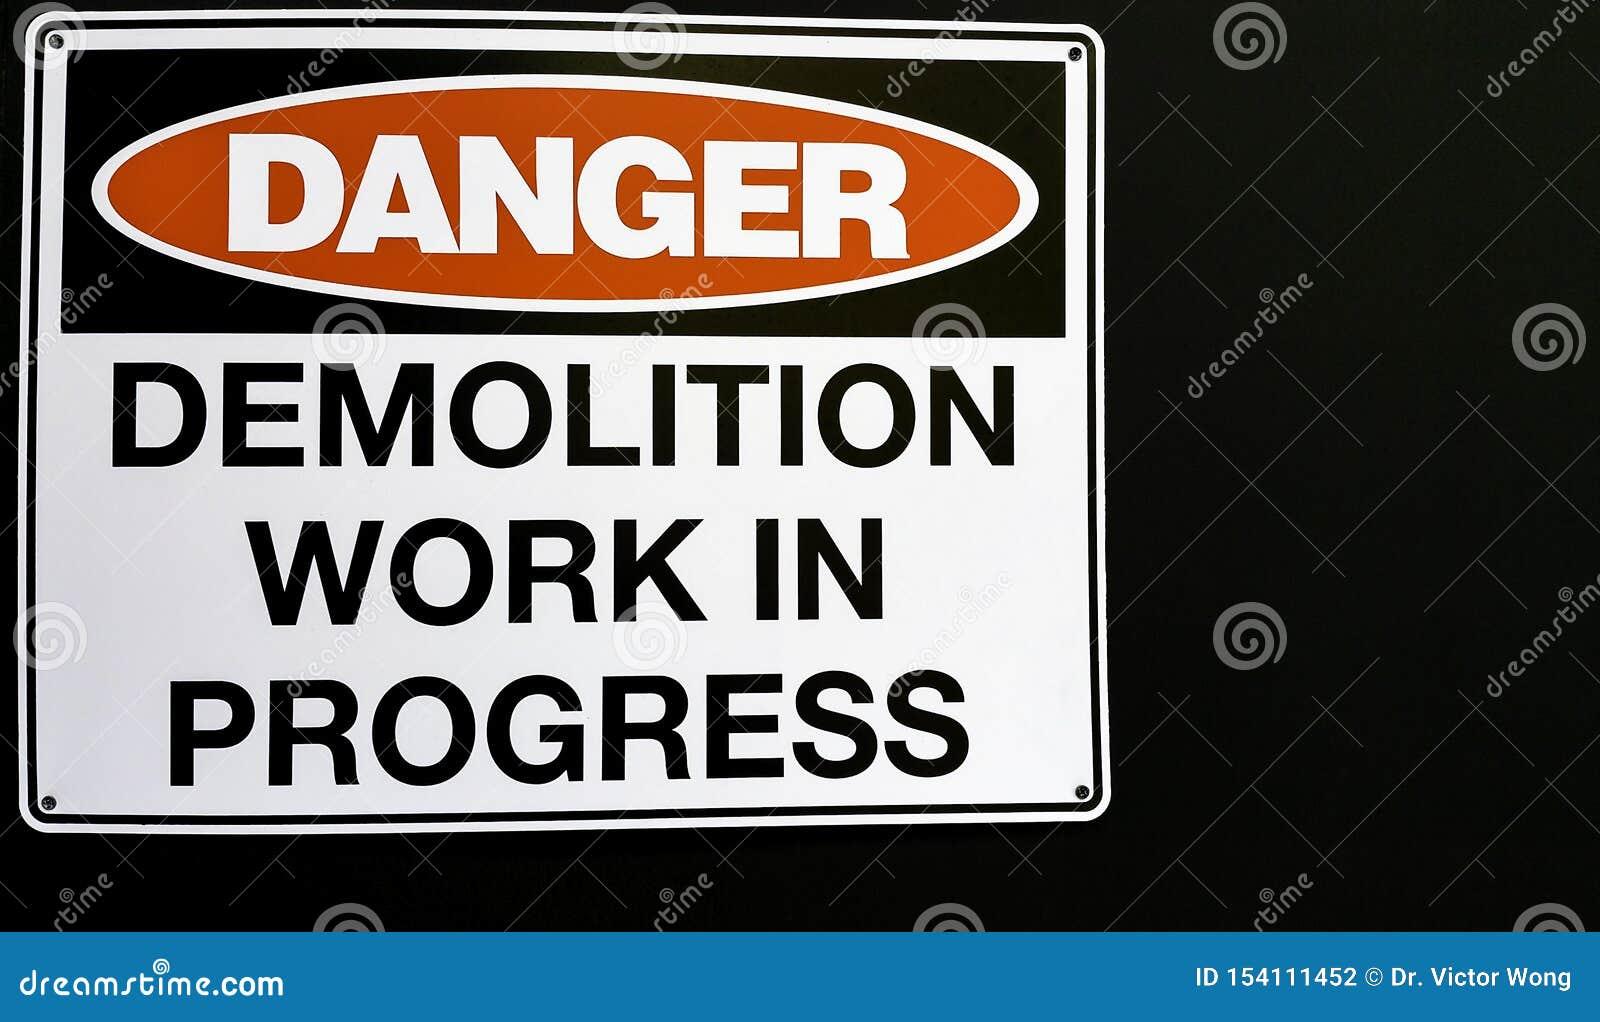 A building demolition sign